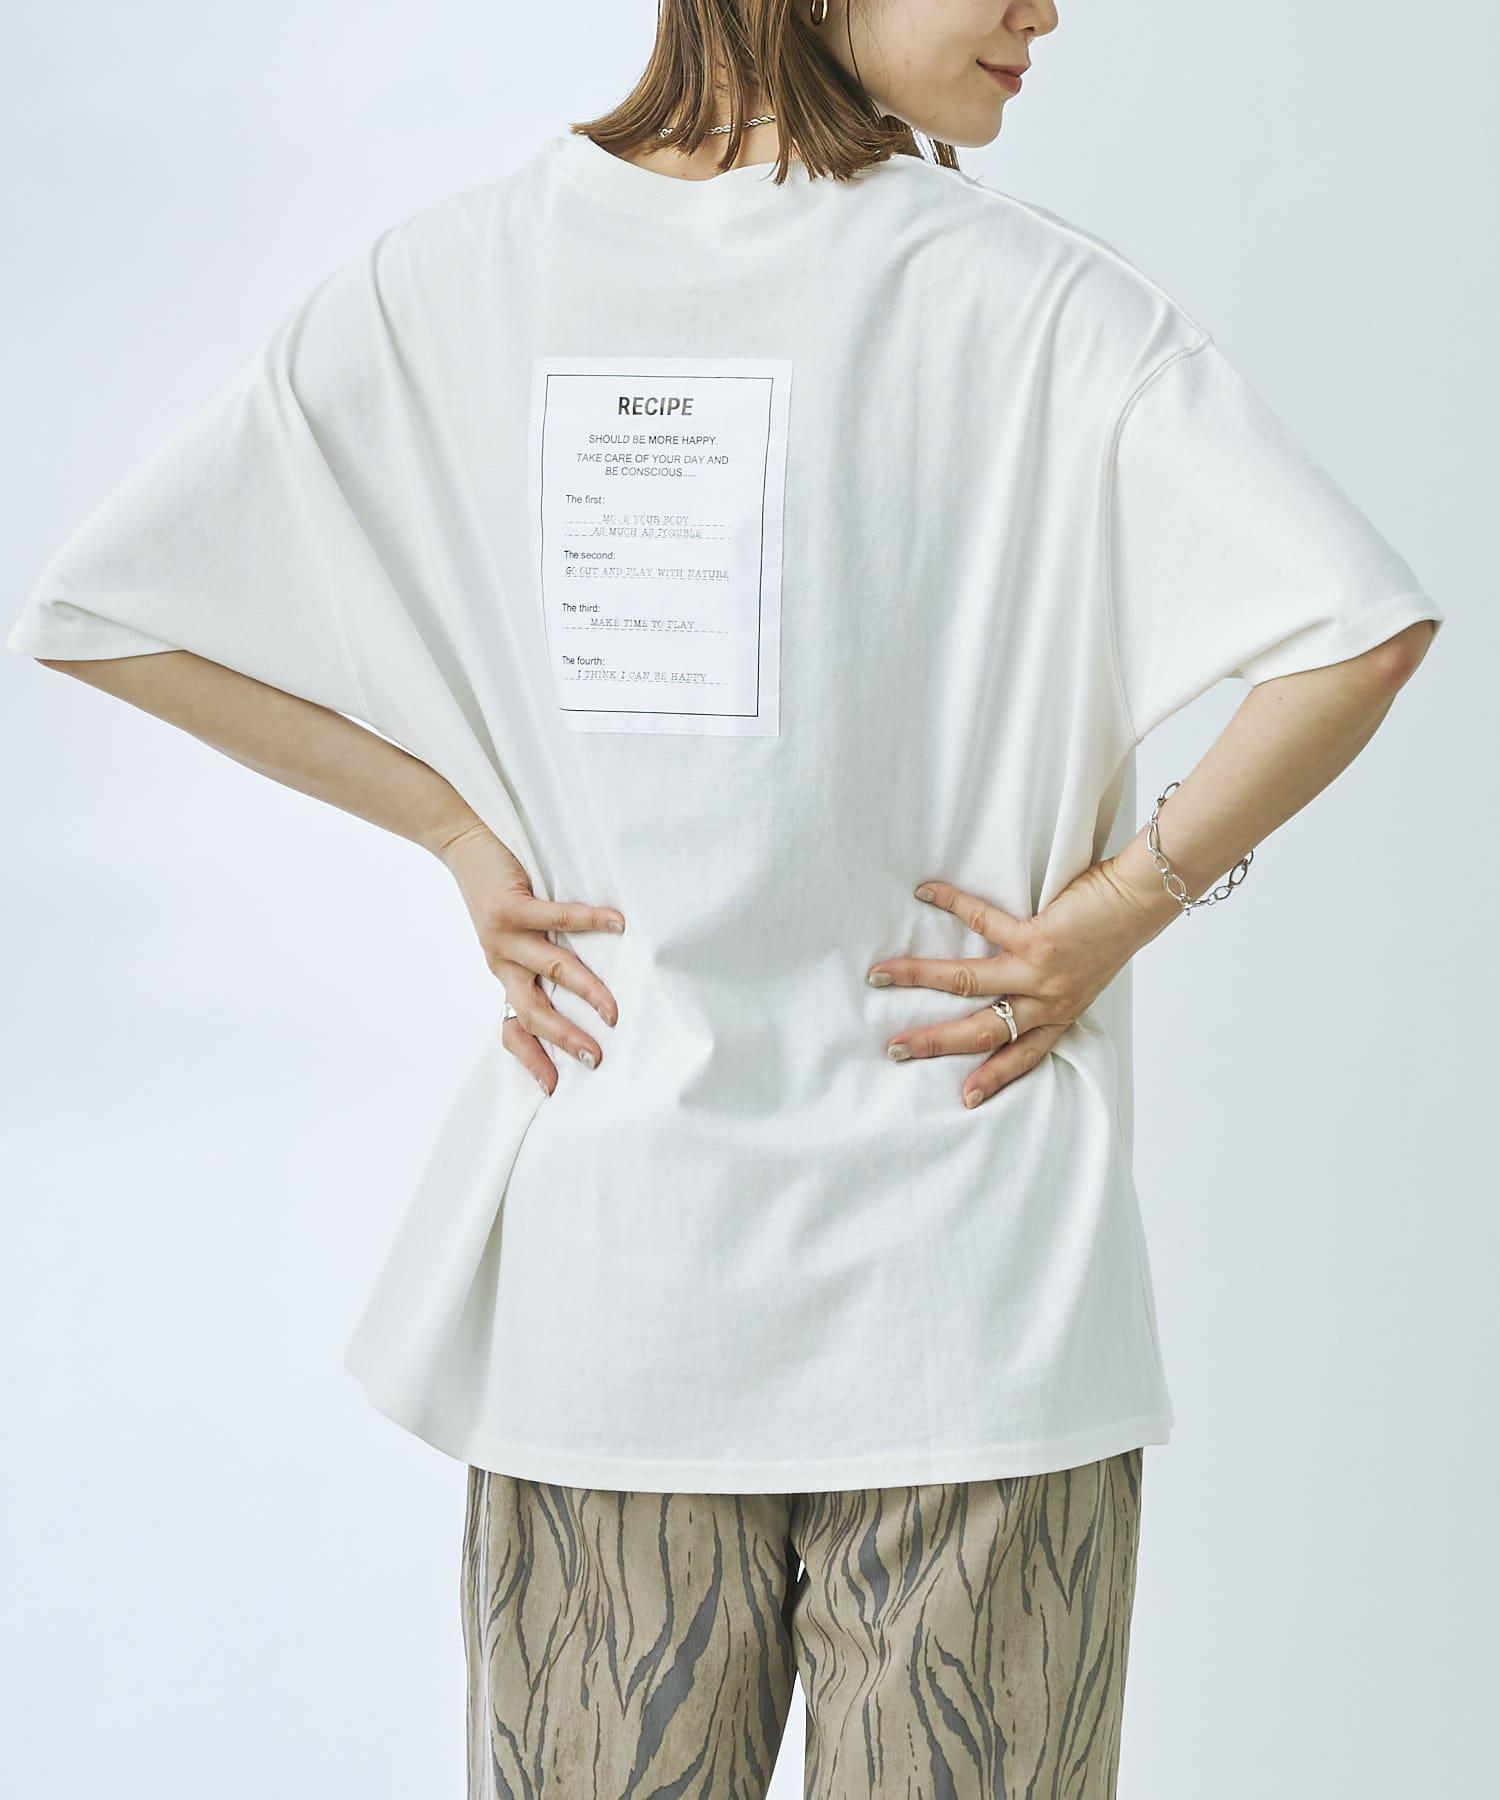 prose verse(プロズヴェール) RECIPEバックタグプリントTシャツ